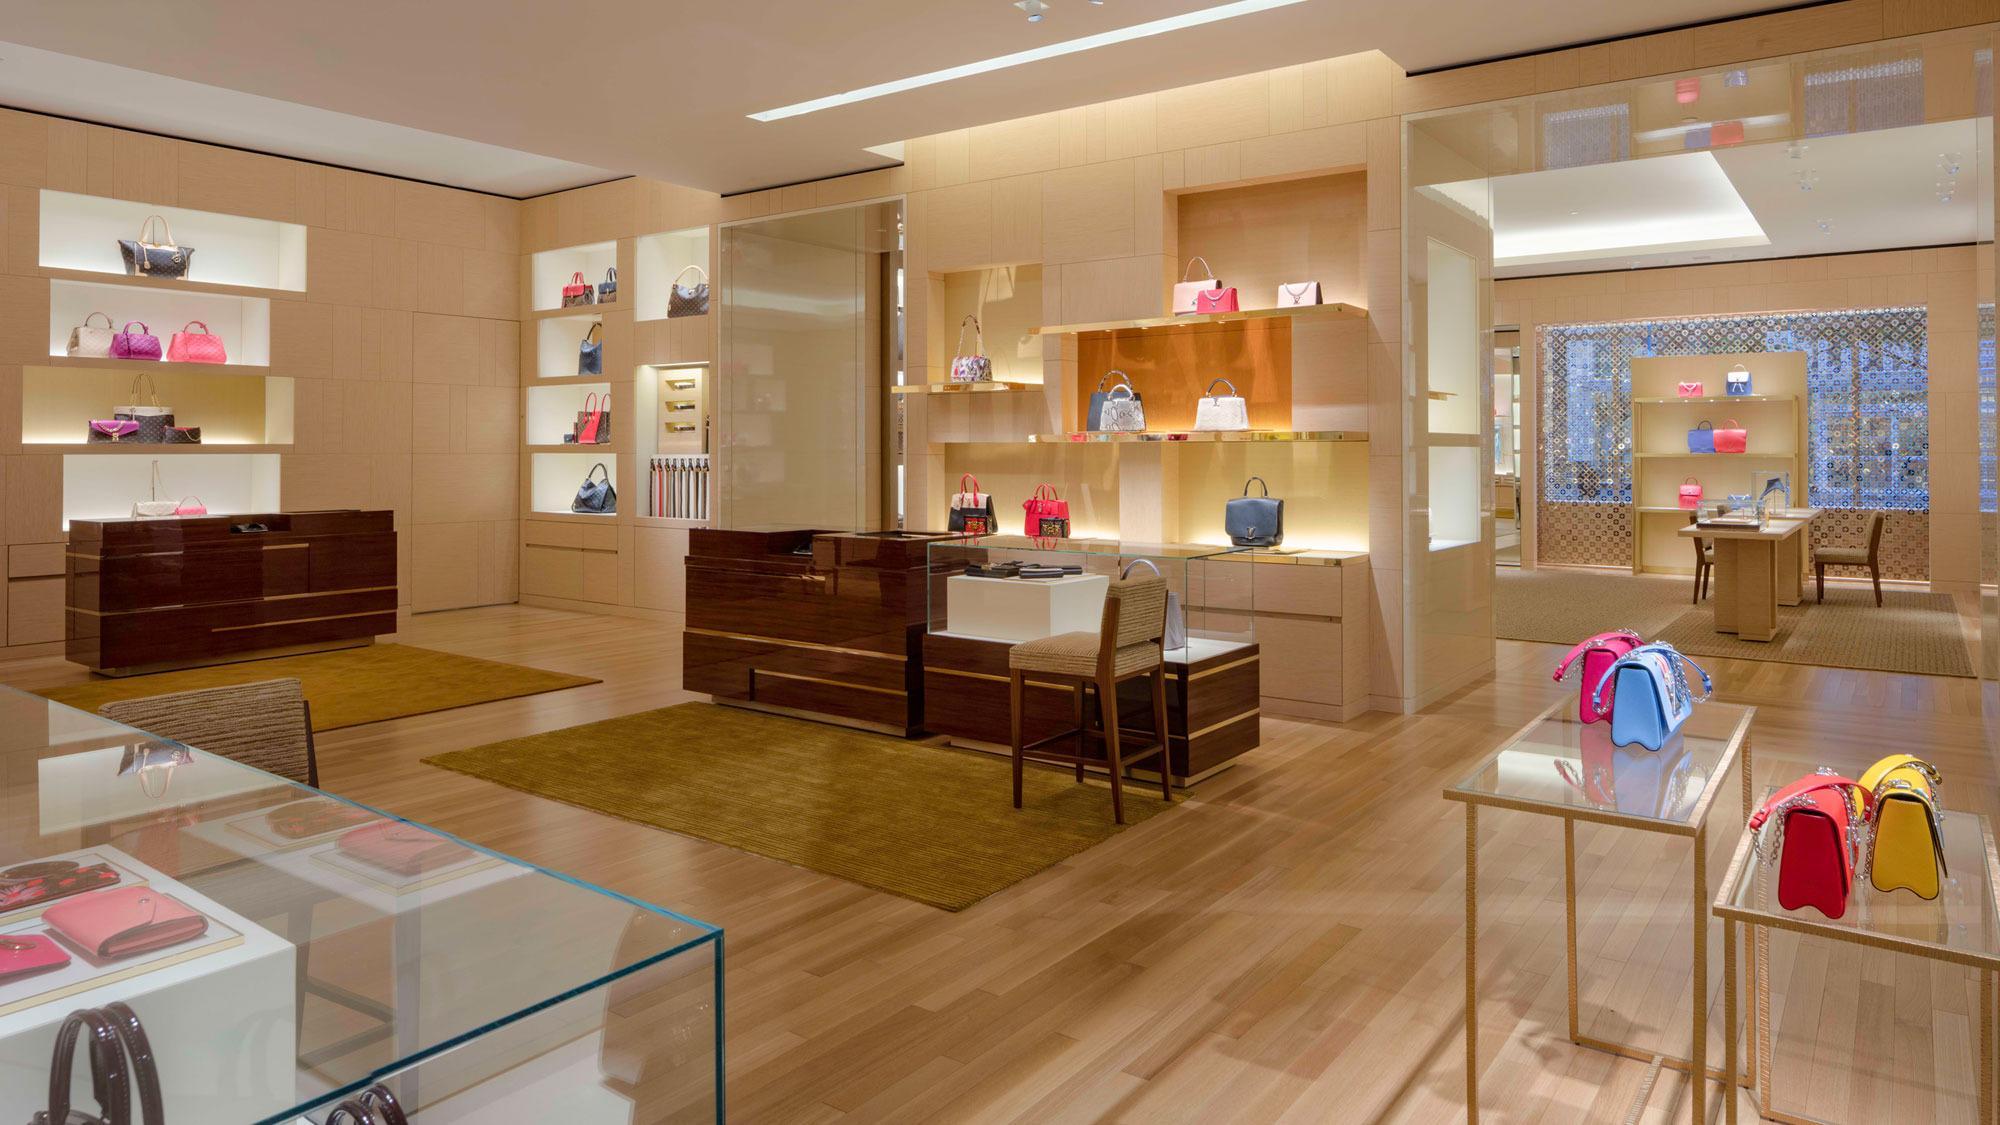 Louis Vuitton Seattle Nordstrom image 1